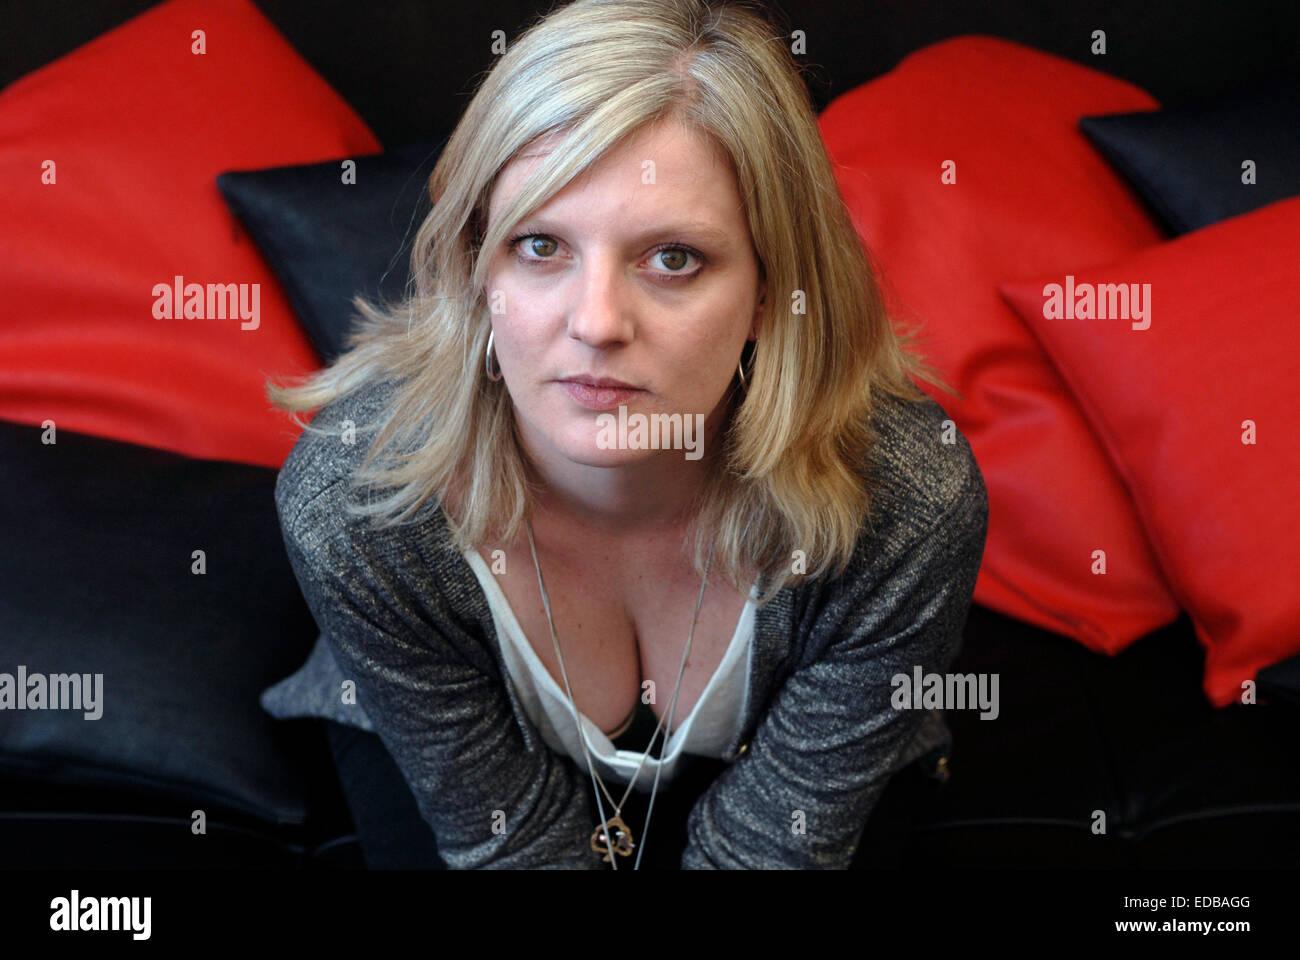 Delphine Bertholon, French Screenwriter, Author, Novelist. In Barcelona - Stock Image